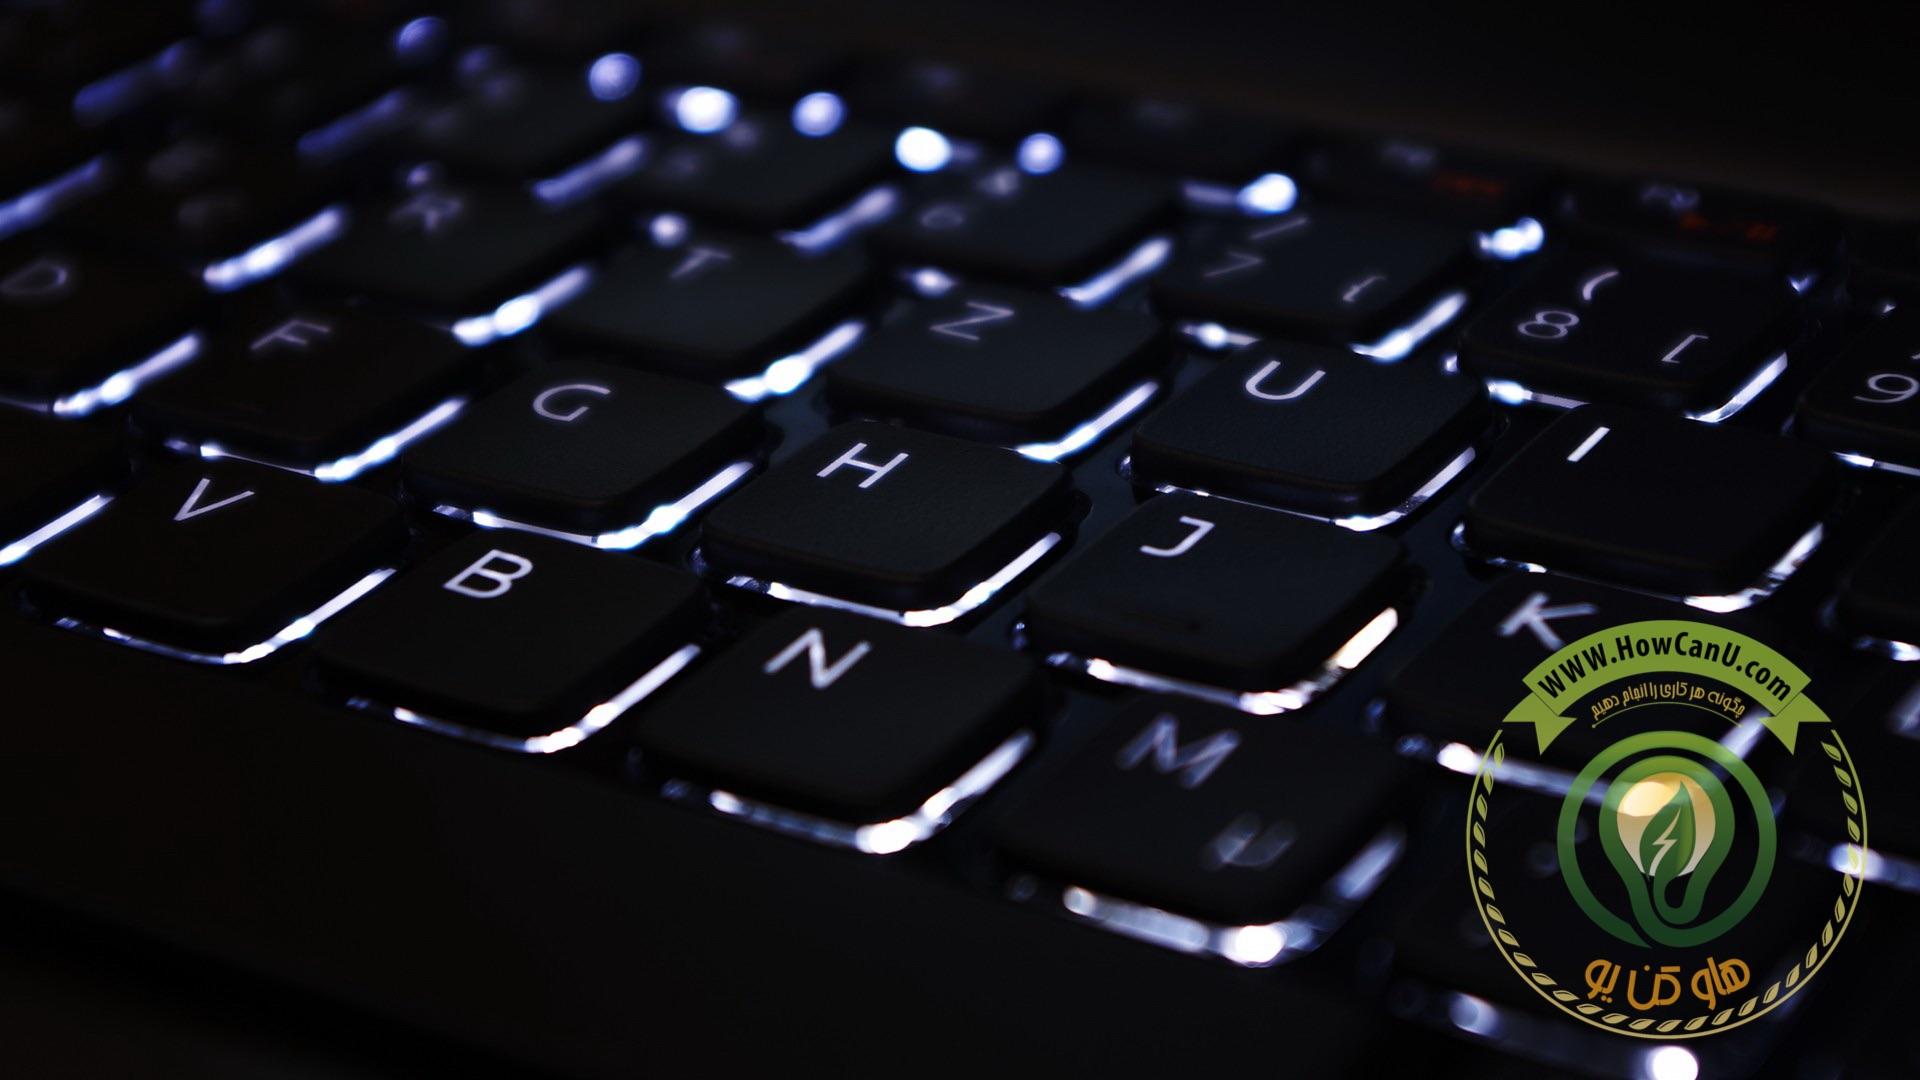 backlit-keyboard-1920x1080-and-free